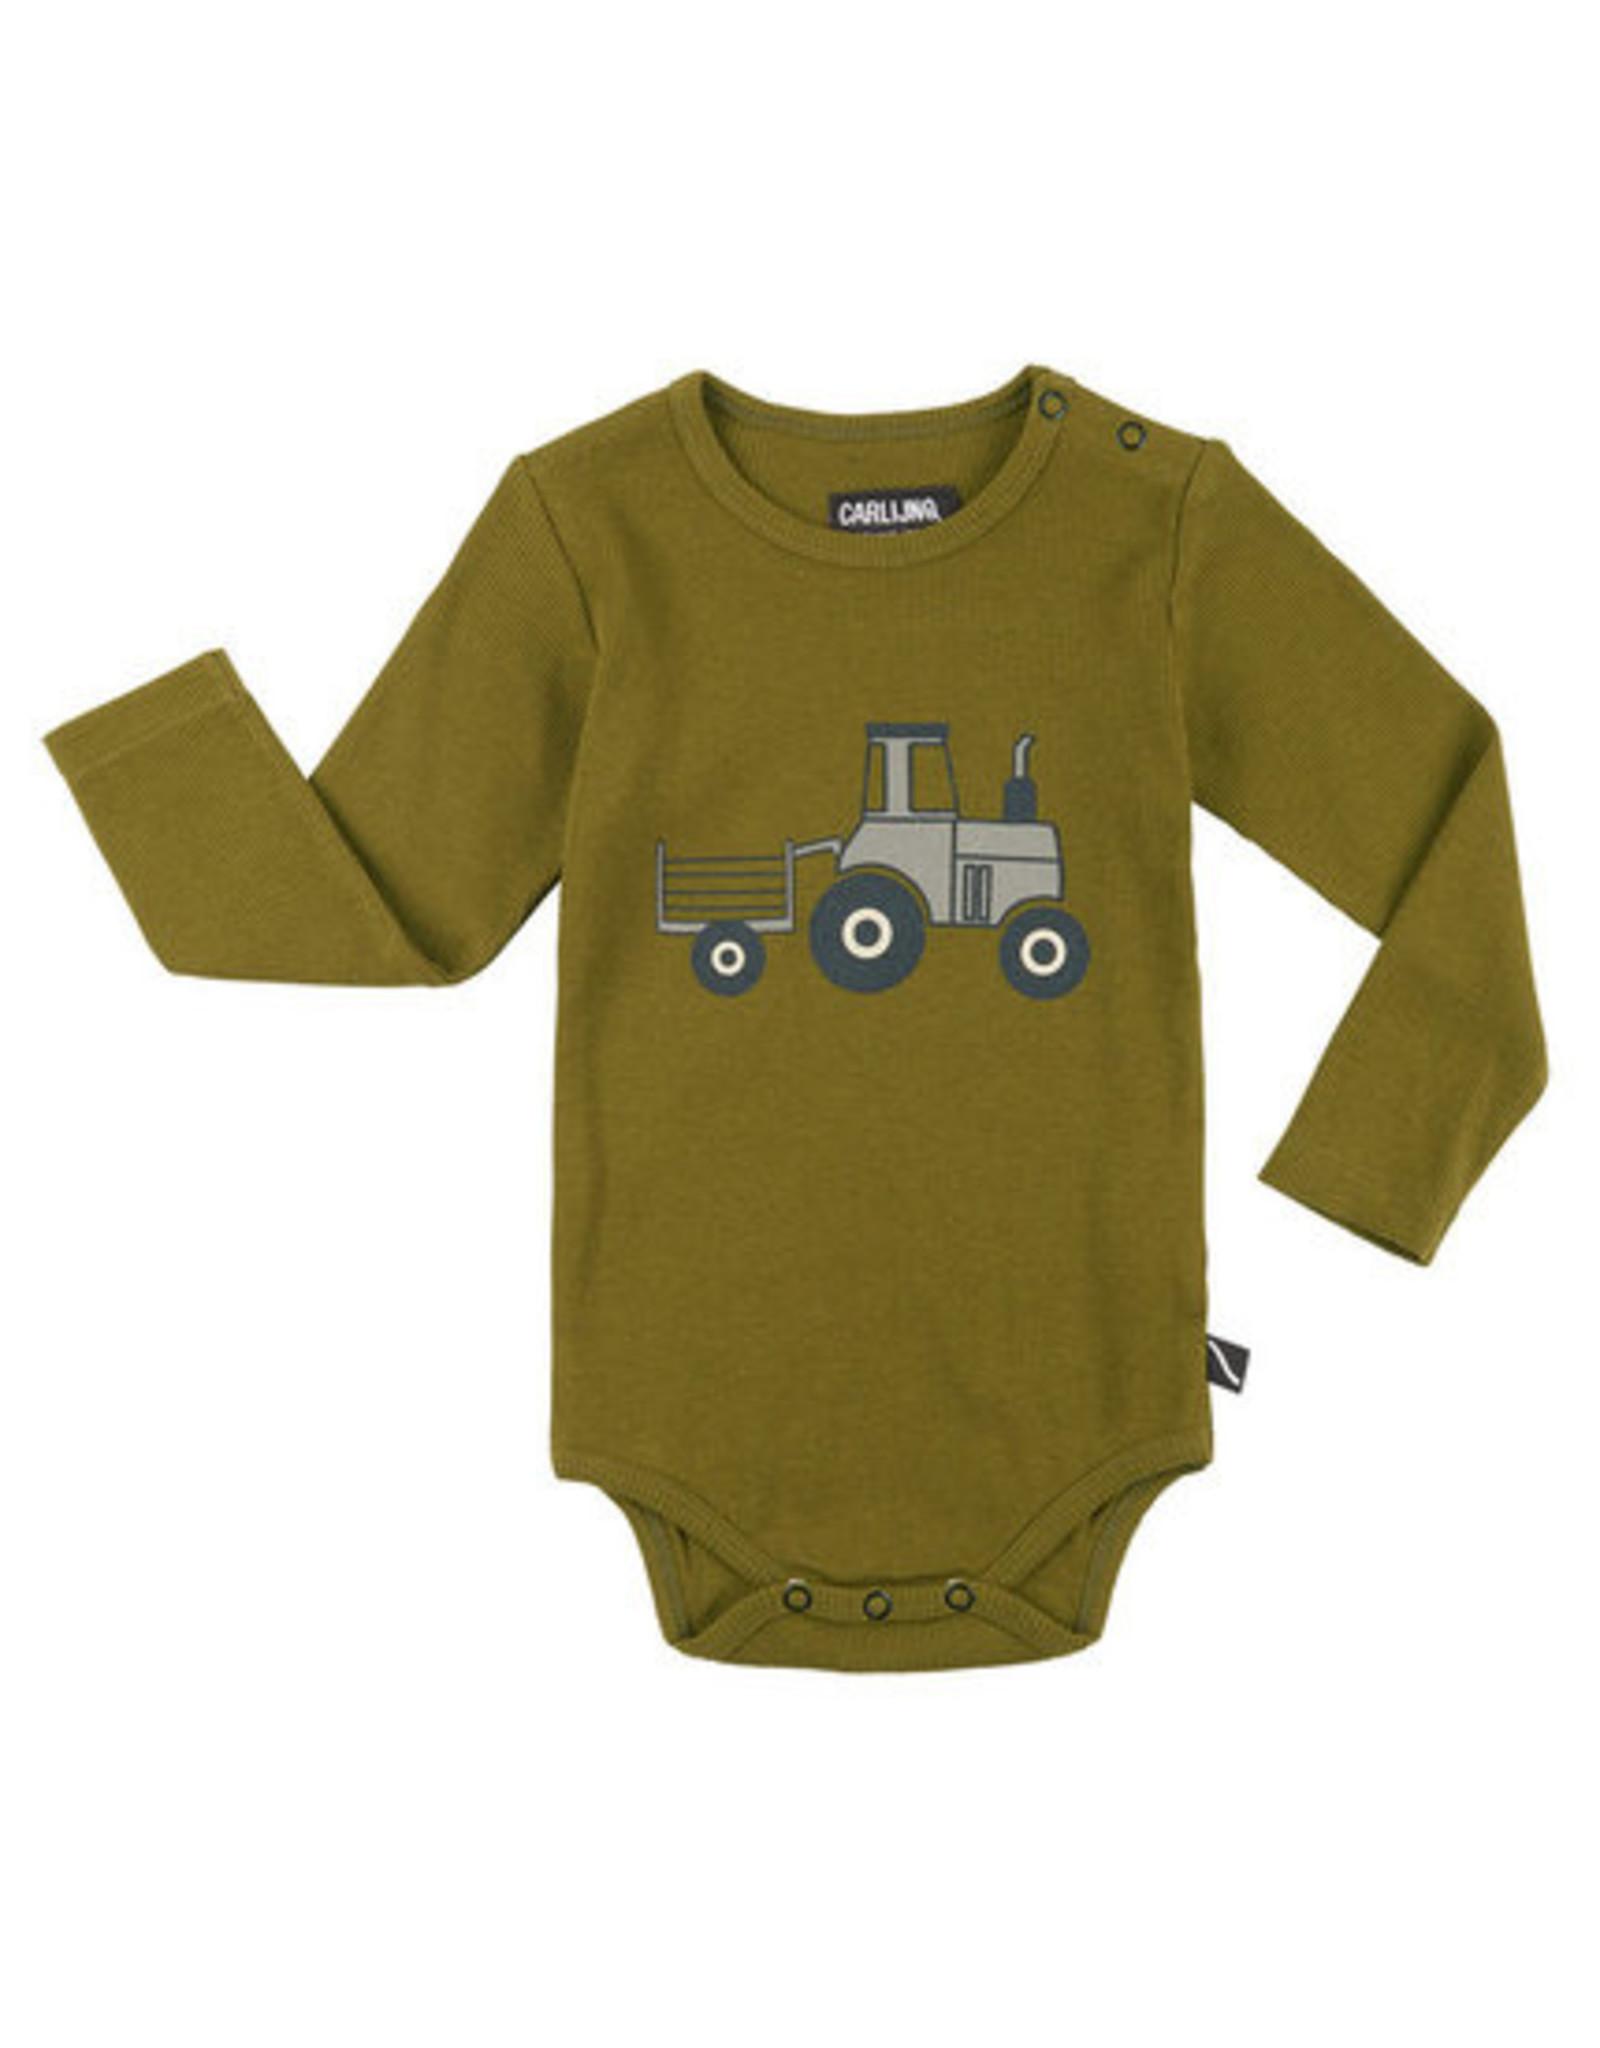 Carlijn Q CarlijnQ  tractor (1) bodysuit